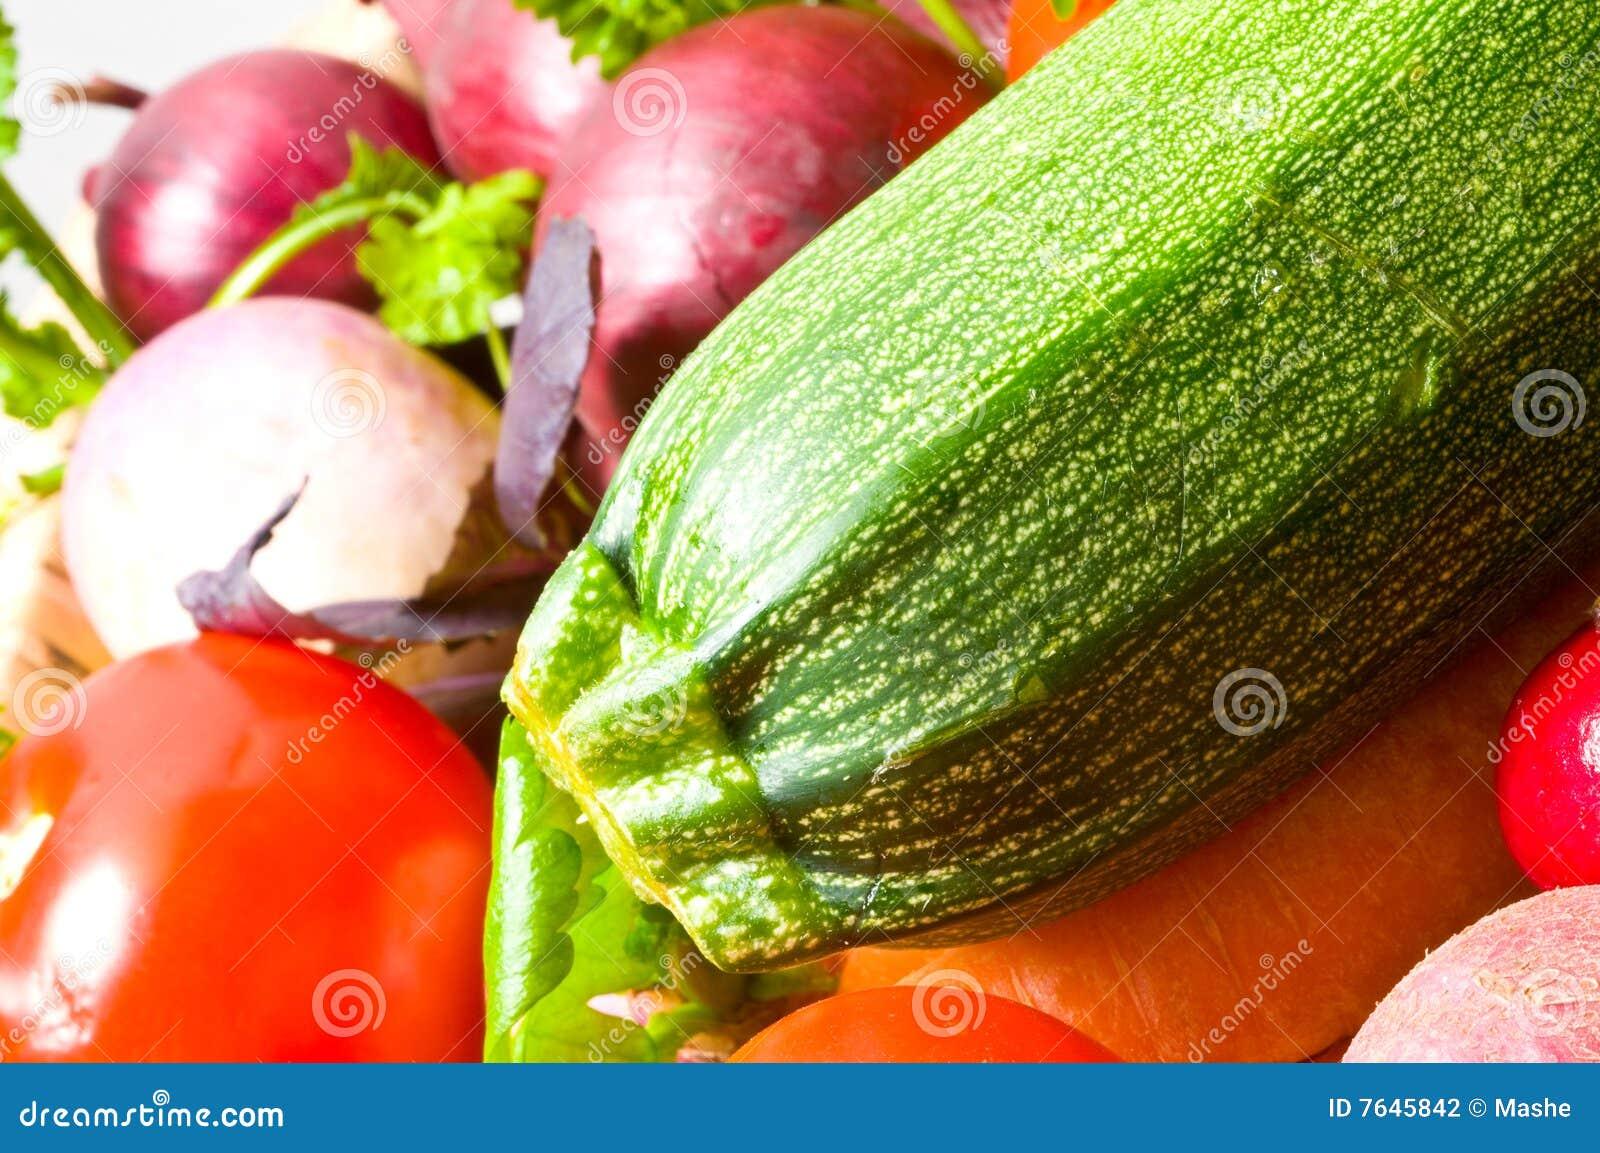 Beautiful vegetables for Beautiful vegetables